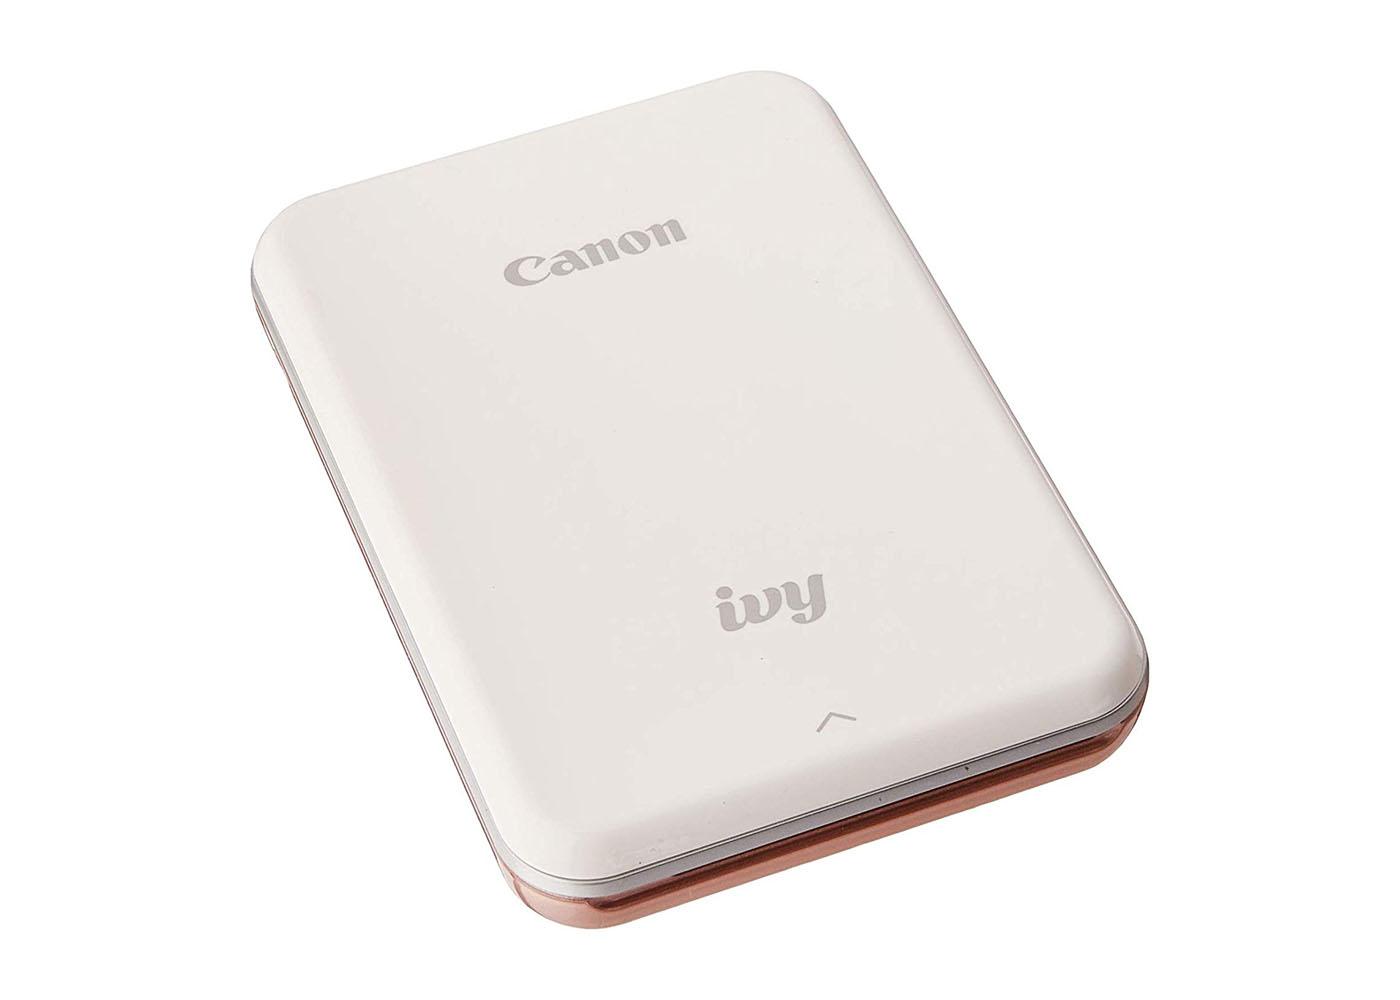 IVY Wireless Mini Photo Printer